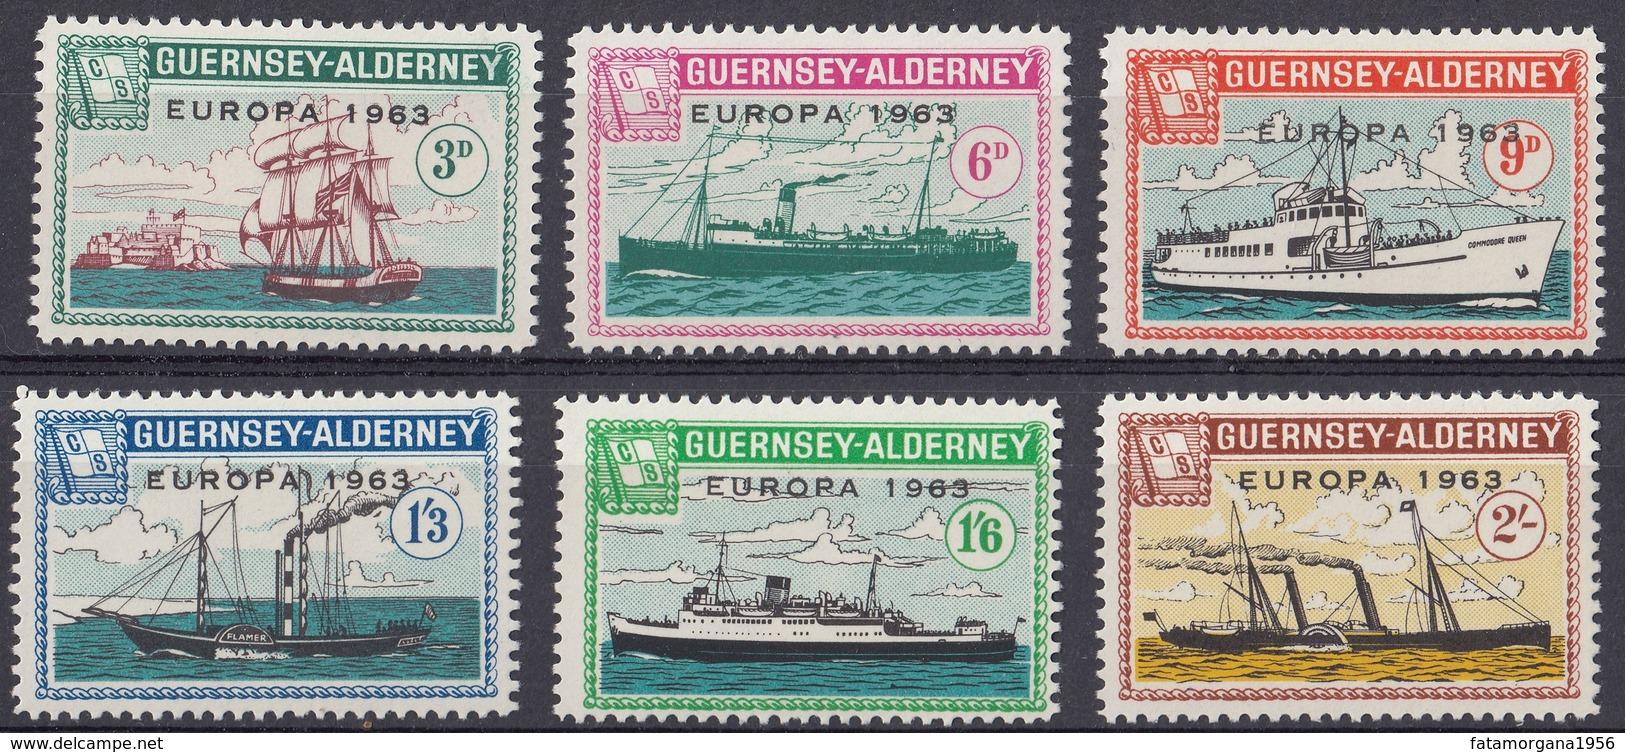 GUERNSEY Local Mail To ALDERNEY - 1963 - Europa - Serie Completa Di 6 Valori MNH, Come Da Immagine. - Guernsey